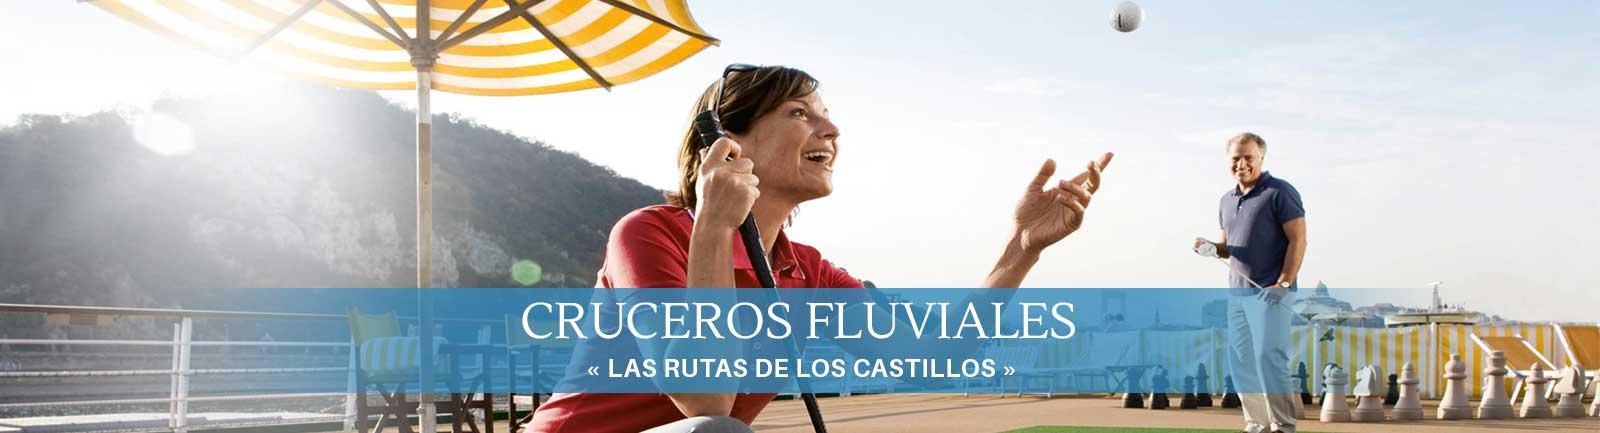 Crucero Fluviales